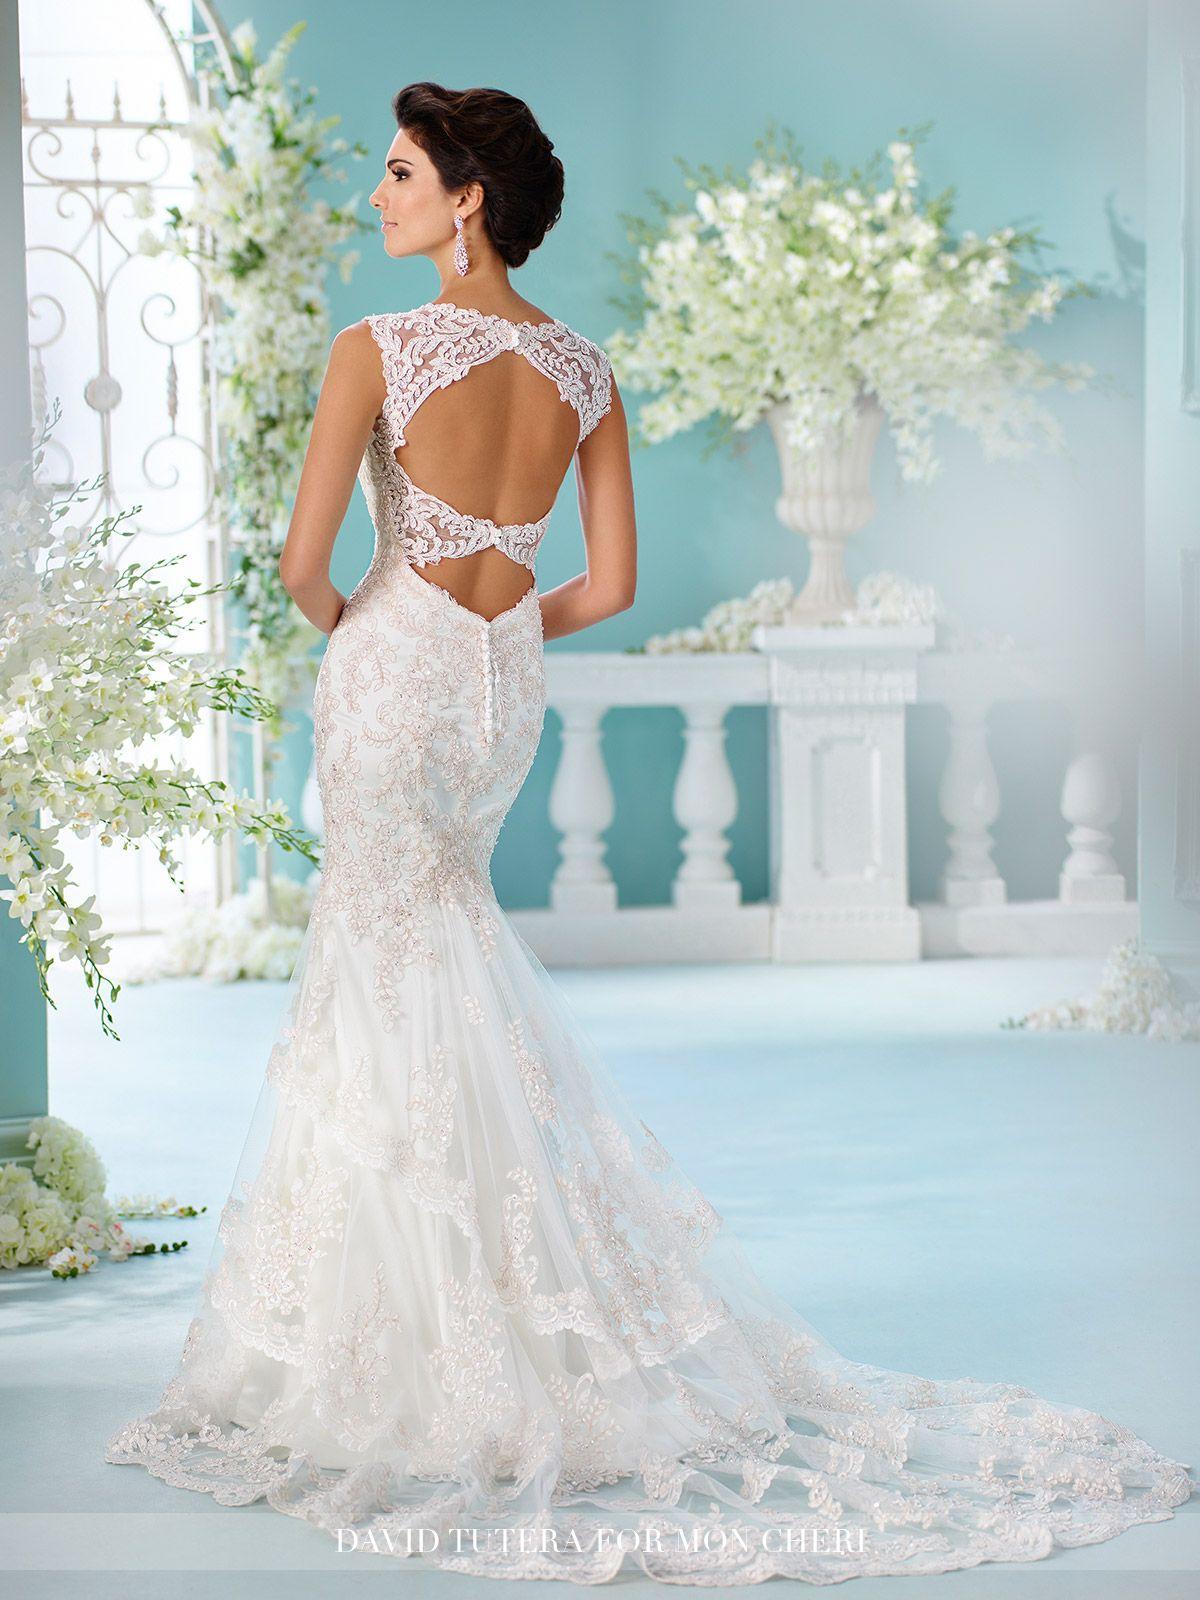 Keyhole Back Satin Fit & Flare with Lace Wedding Dress- 216246 ...